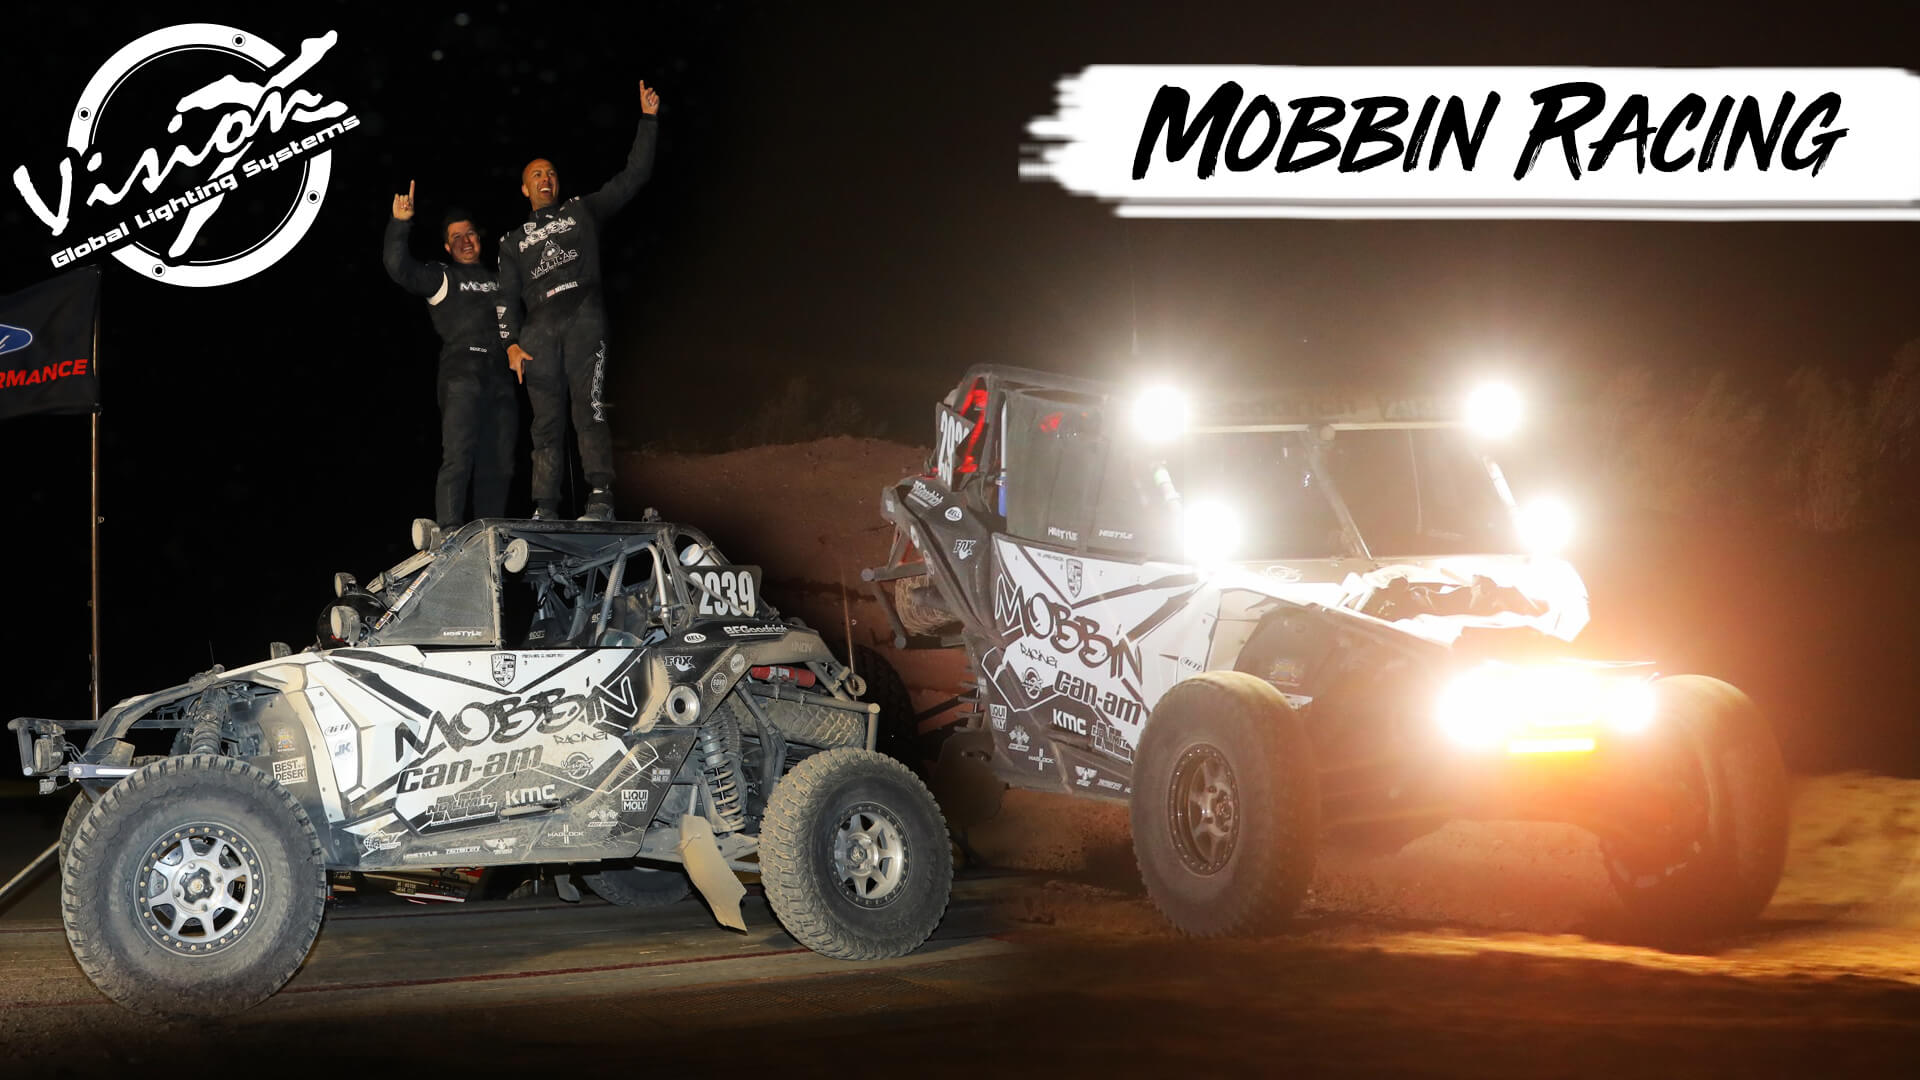 Mobbin Racing Secures UTV Championship with Vision X Lighting